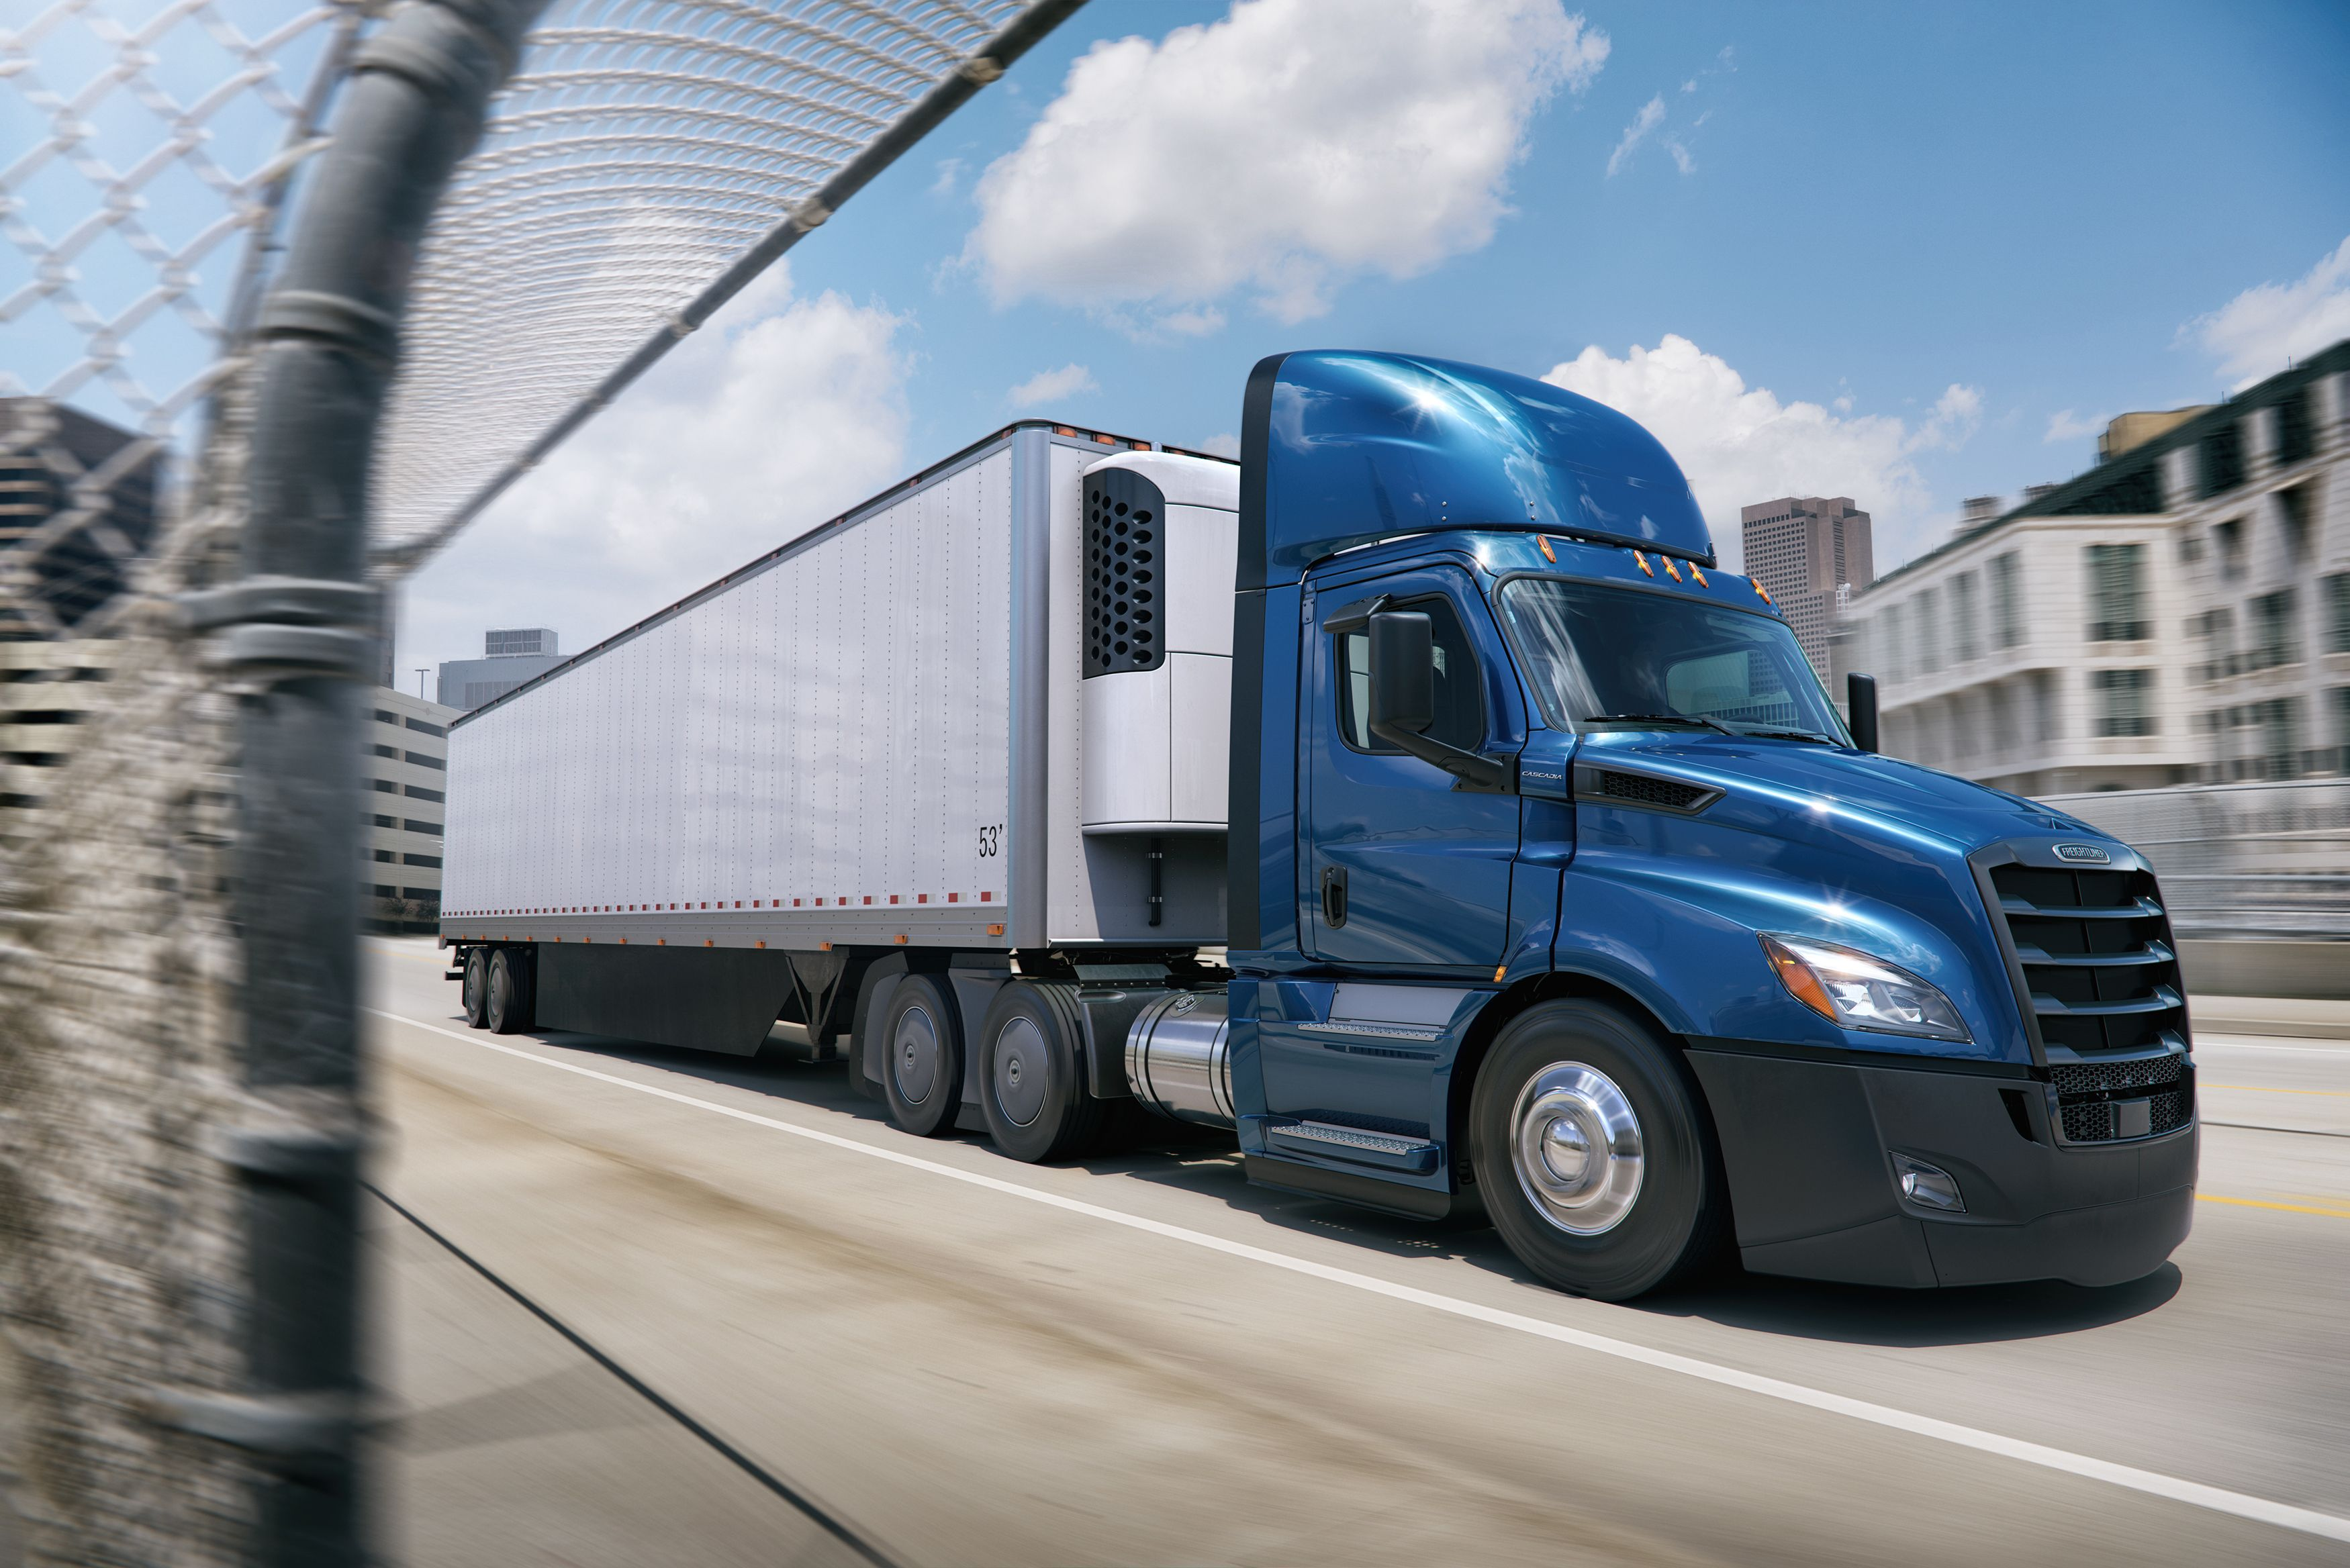 2017 Freightliner Cascadia Freightliner Trucks